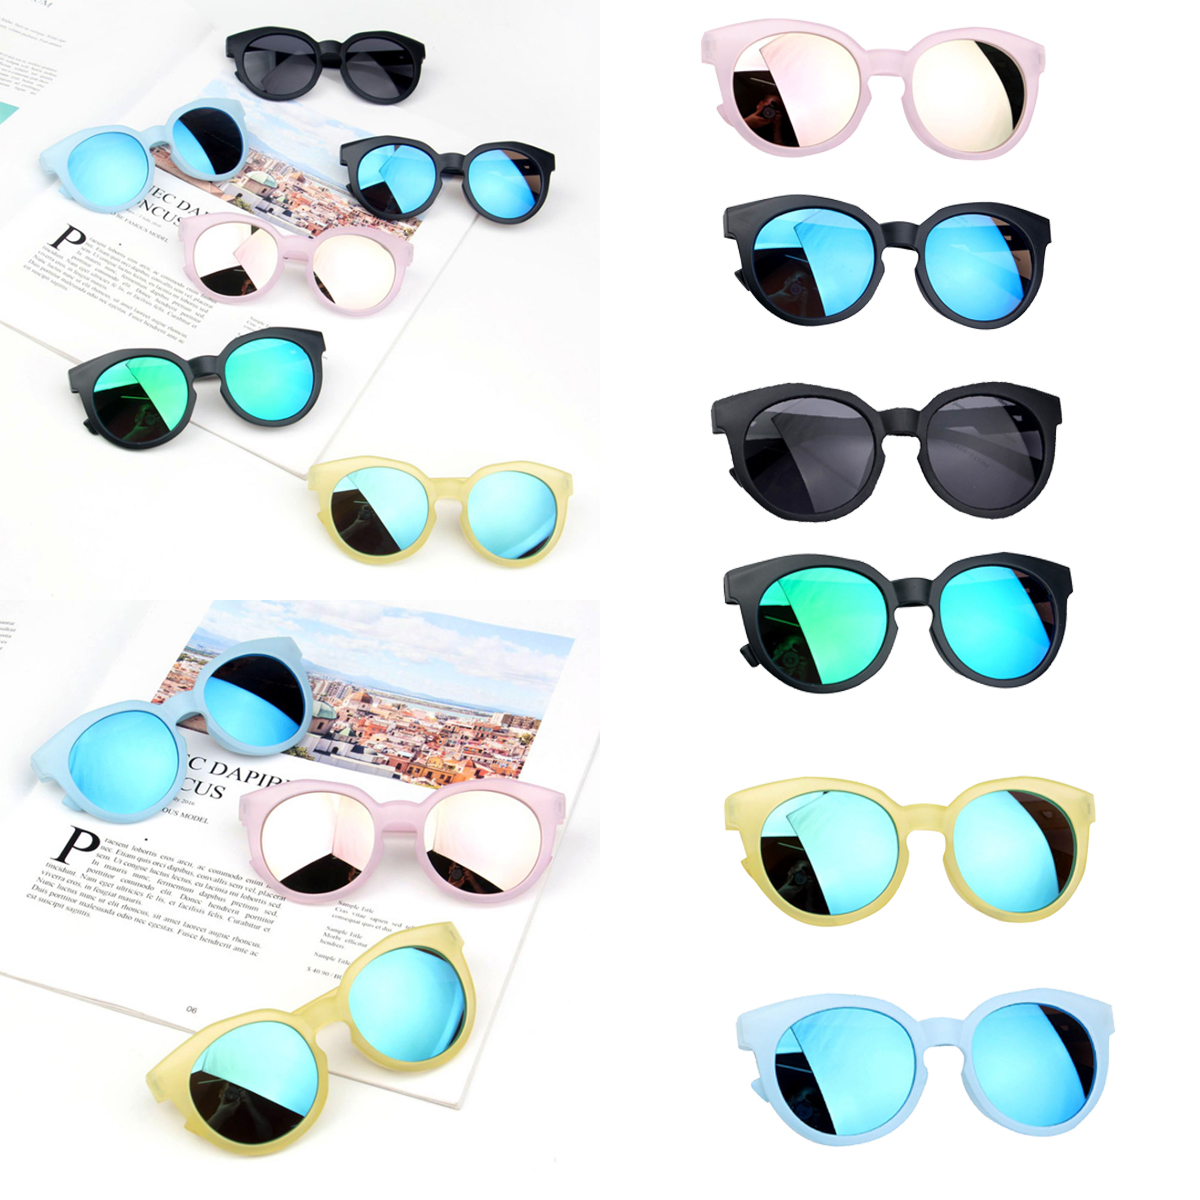 Children's Boys Girls Kids Sunglasses Shades Bright Lenses UV400 Protection